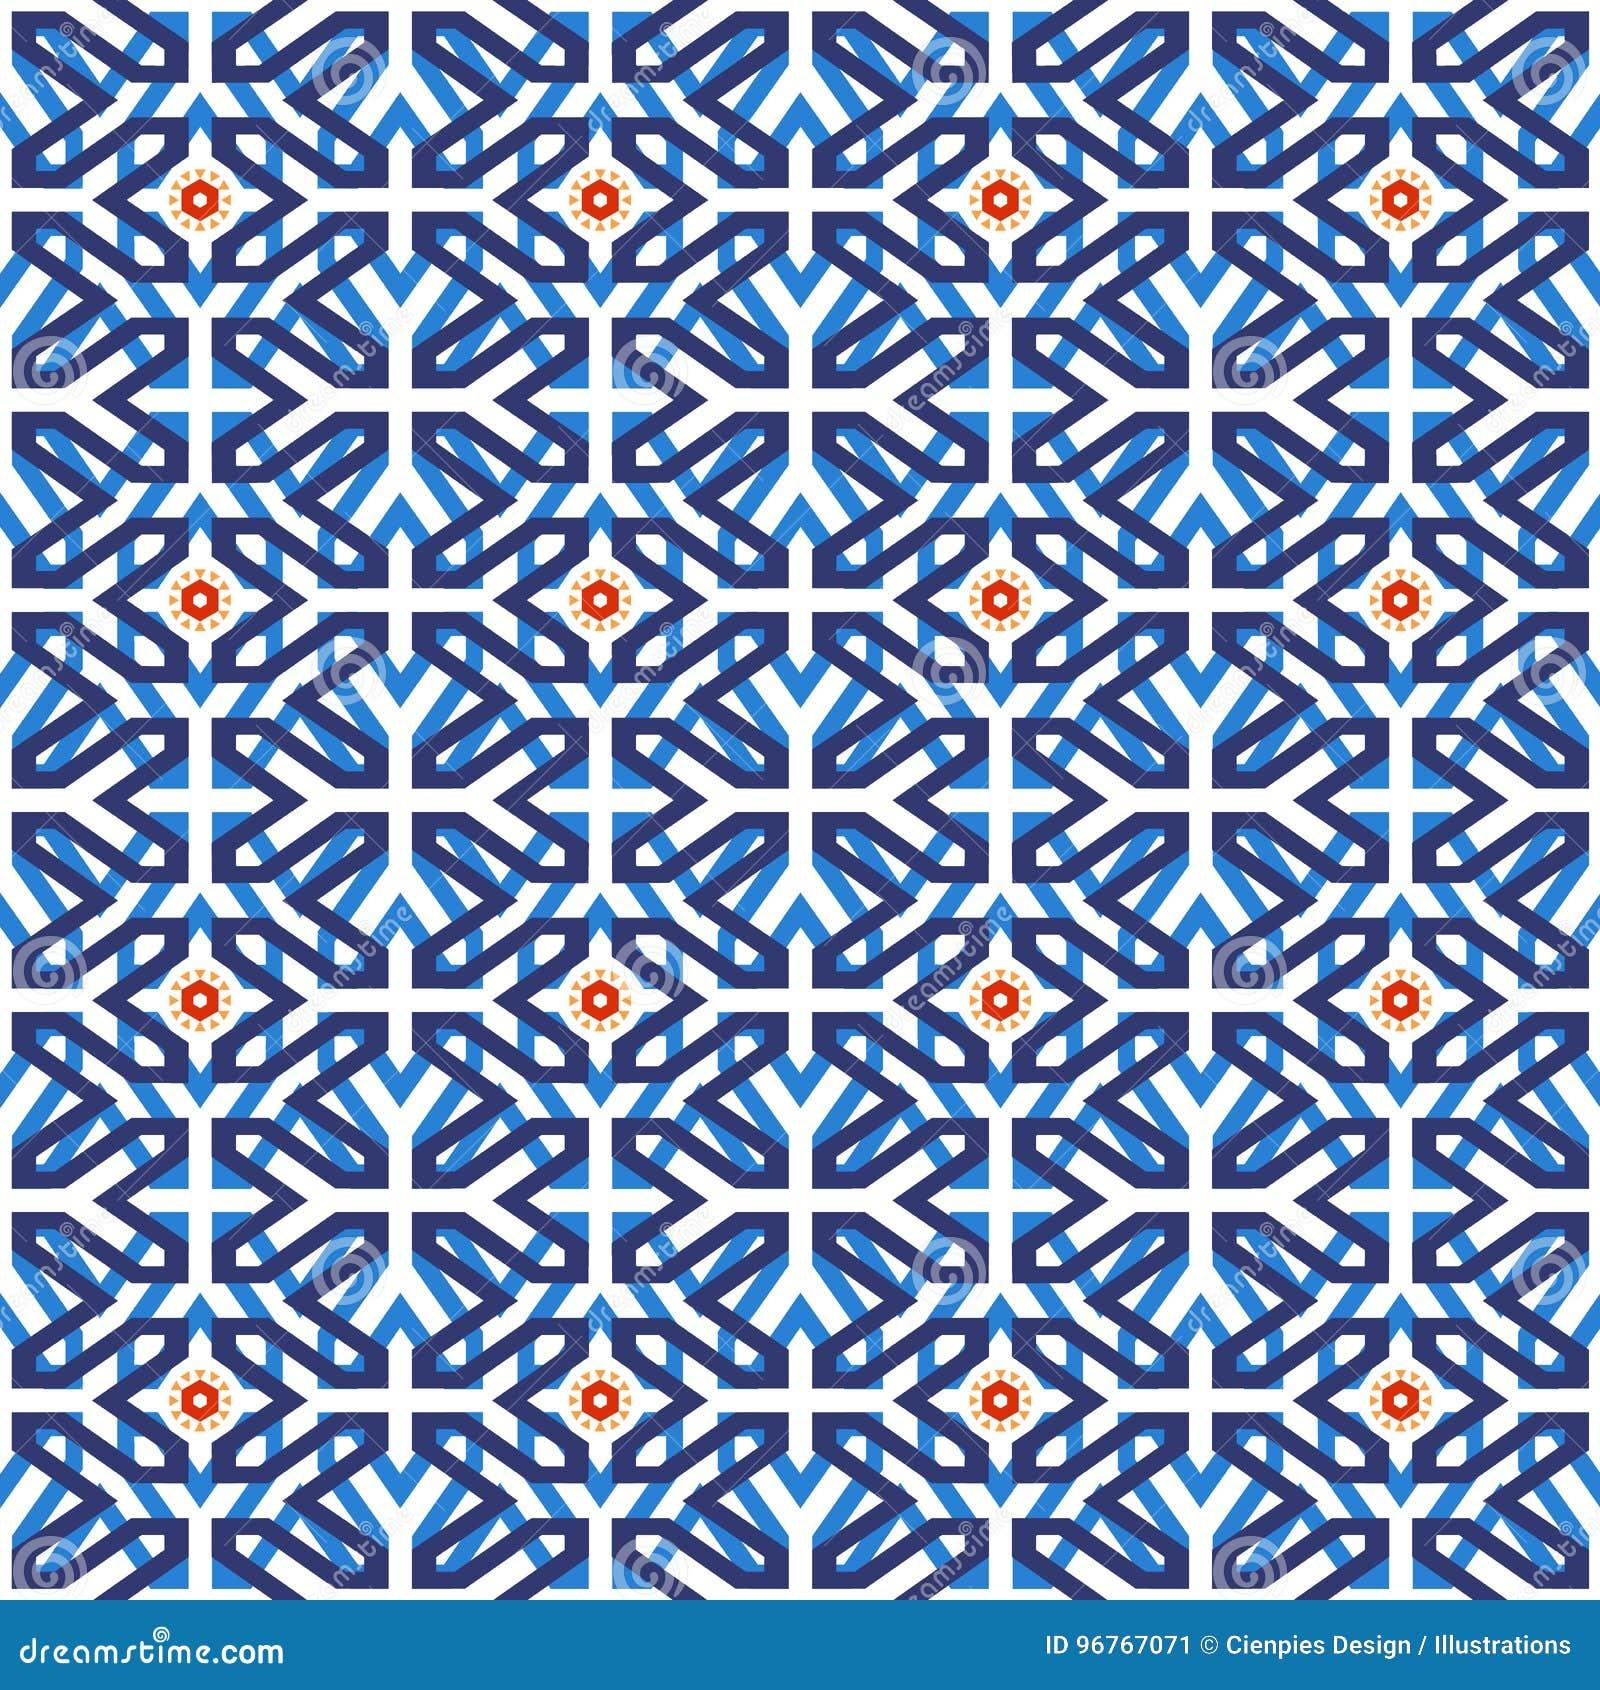 Arab Muslim Mosaic Tile Vintage Seamless Pattern Stock Vector ...